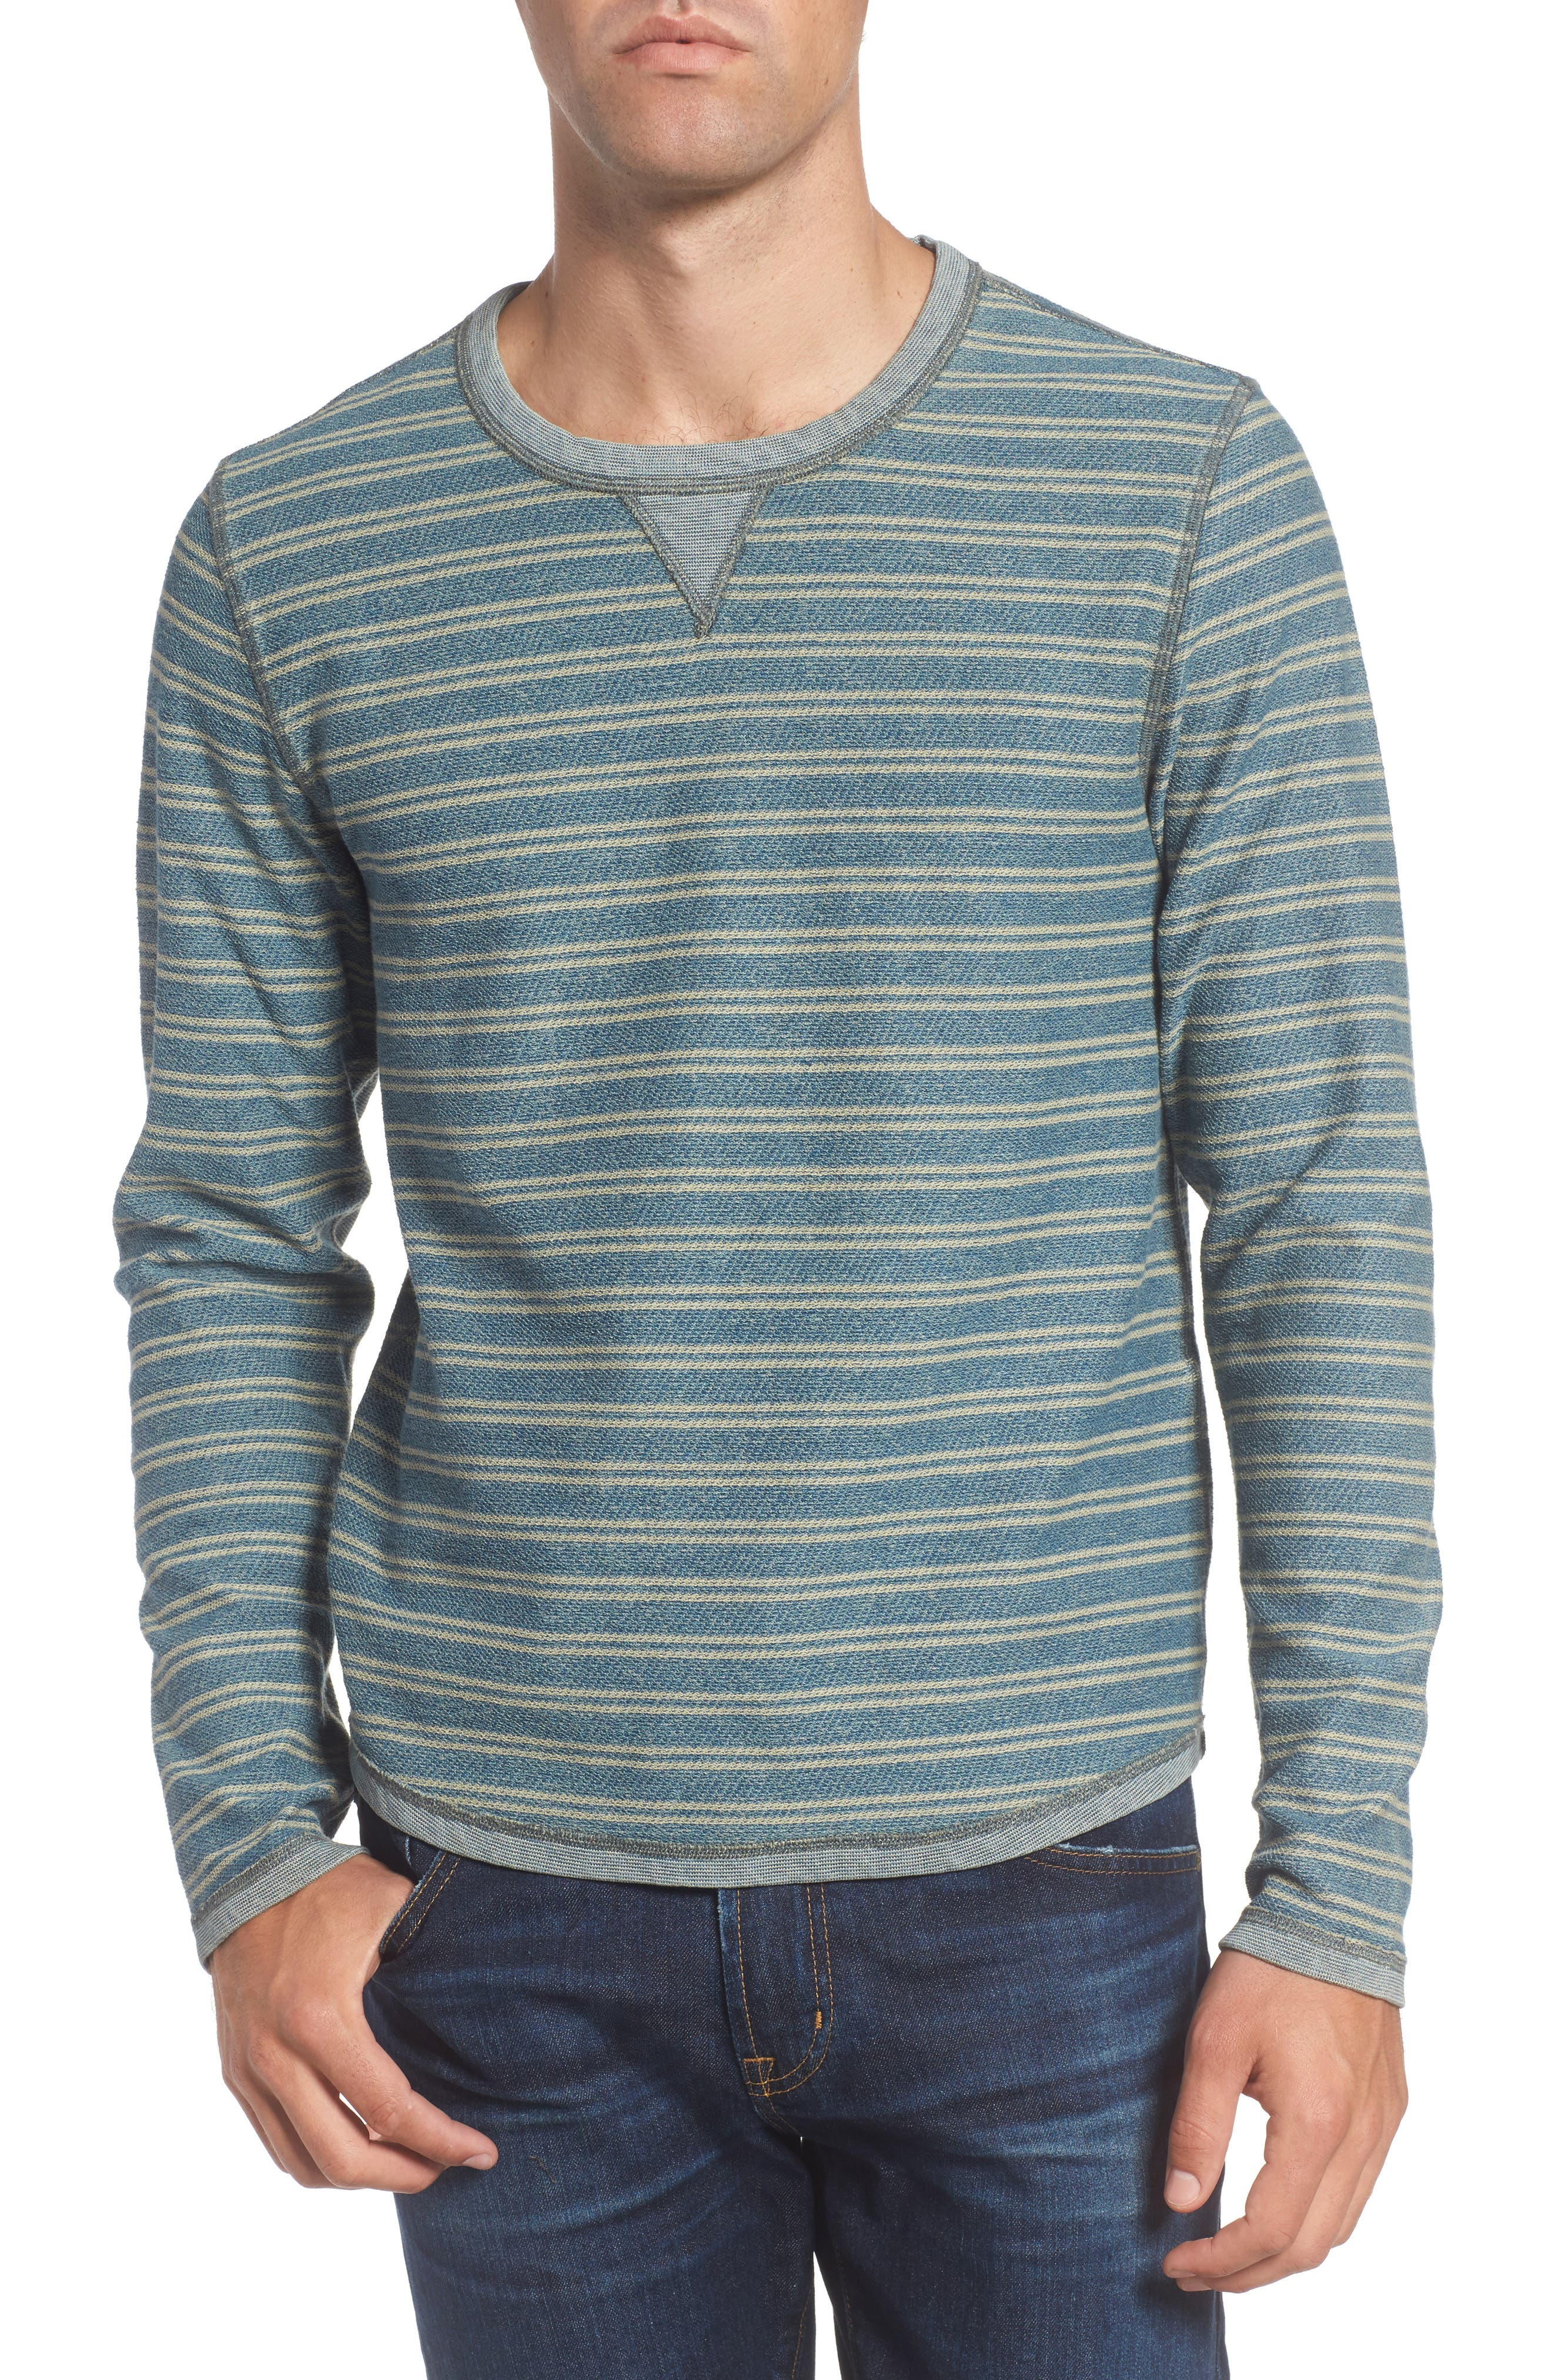 Strickland Reversible Crewneck Sweatshirt,                         Main,                         color, Aspen Heather 2